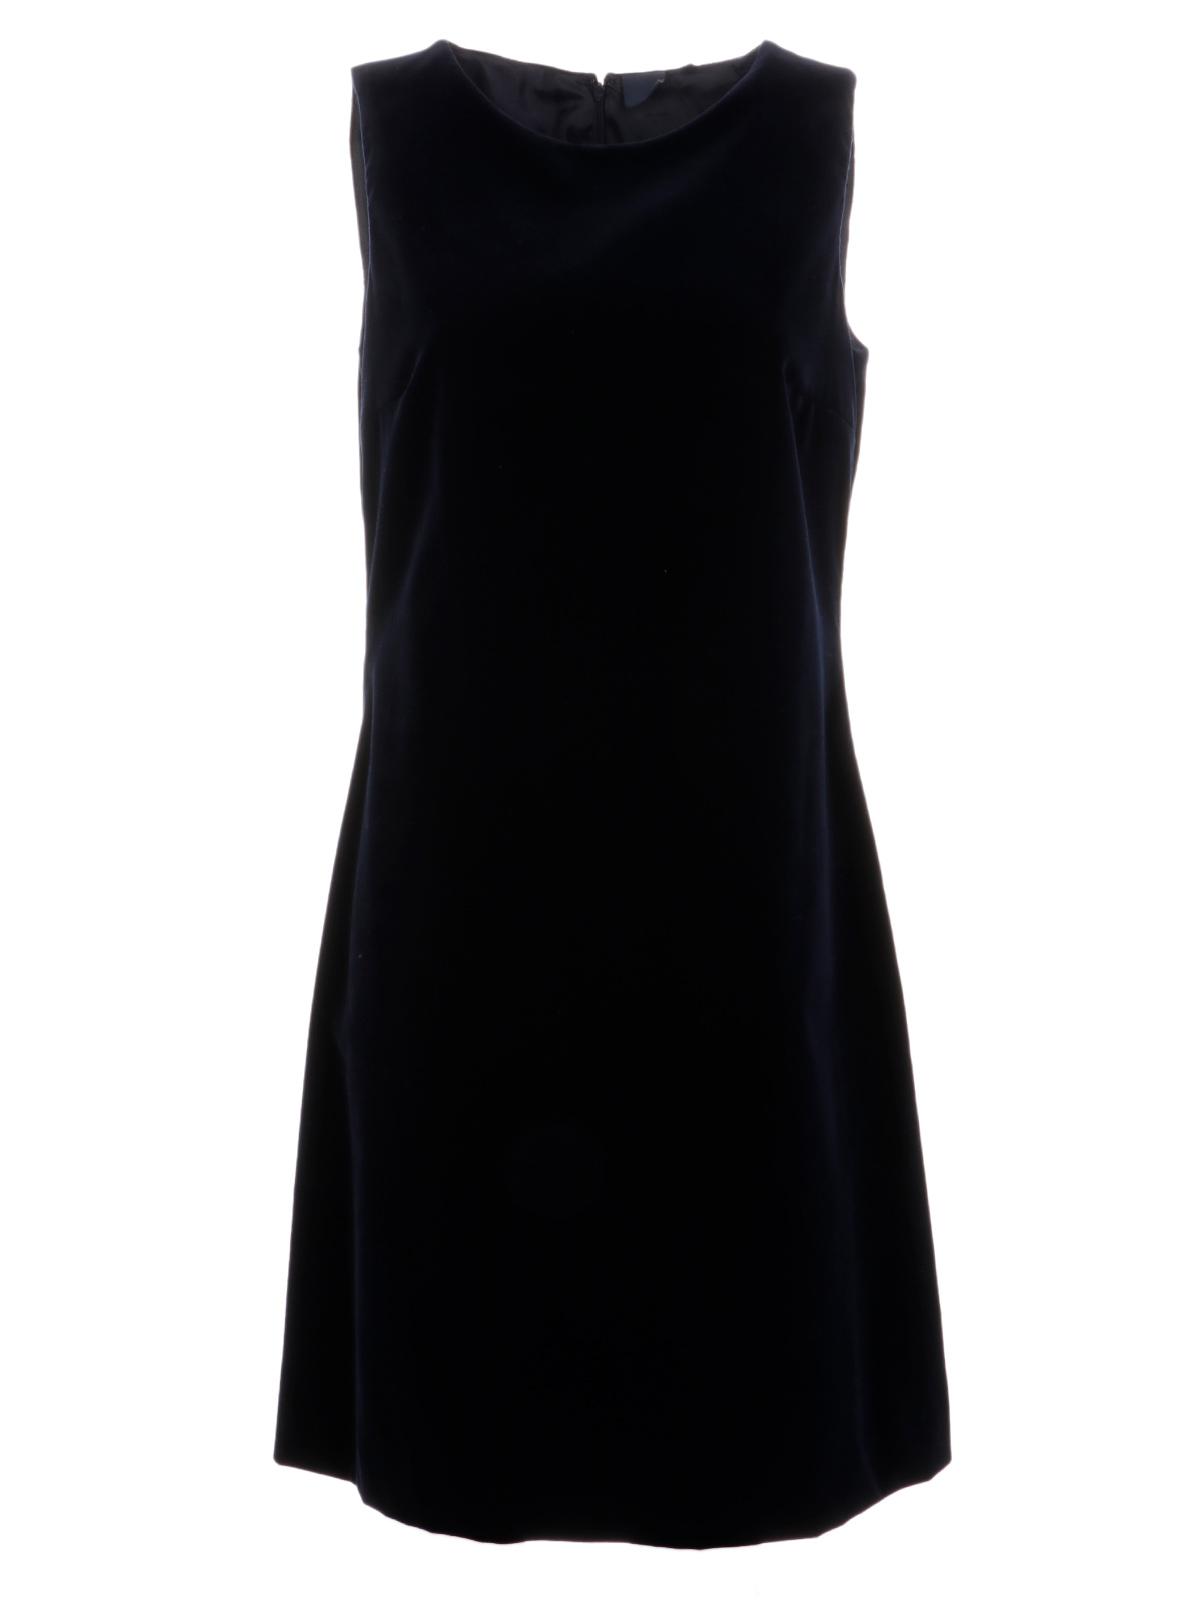 Picture of ASPESI | Women's Sleeveless Dress